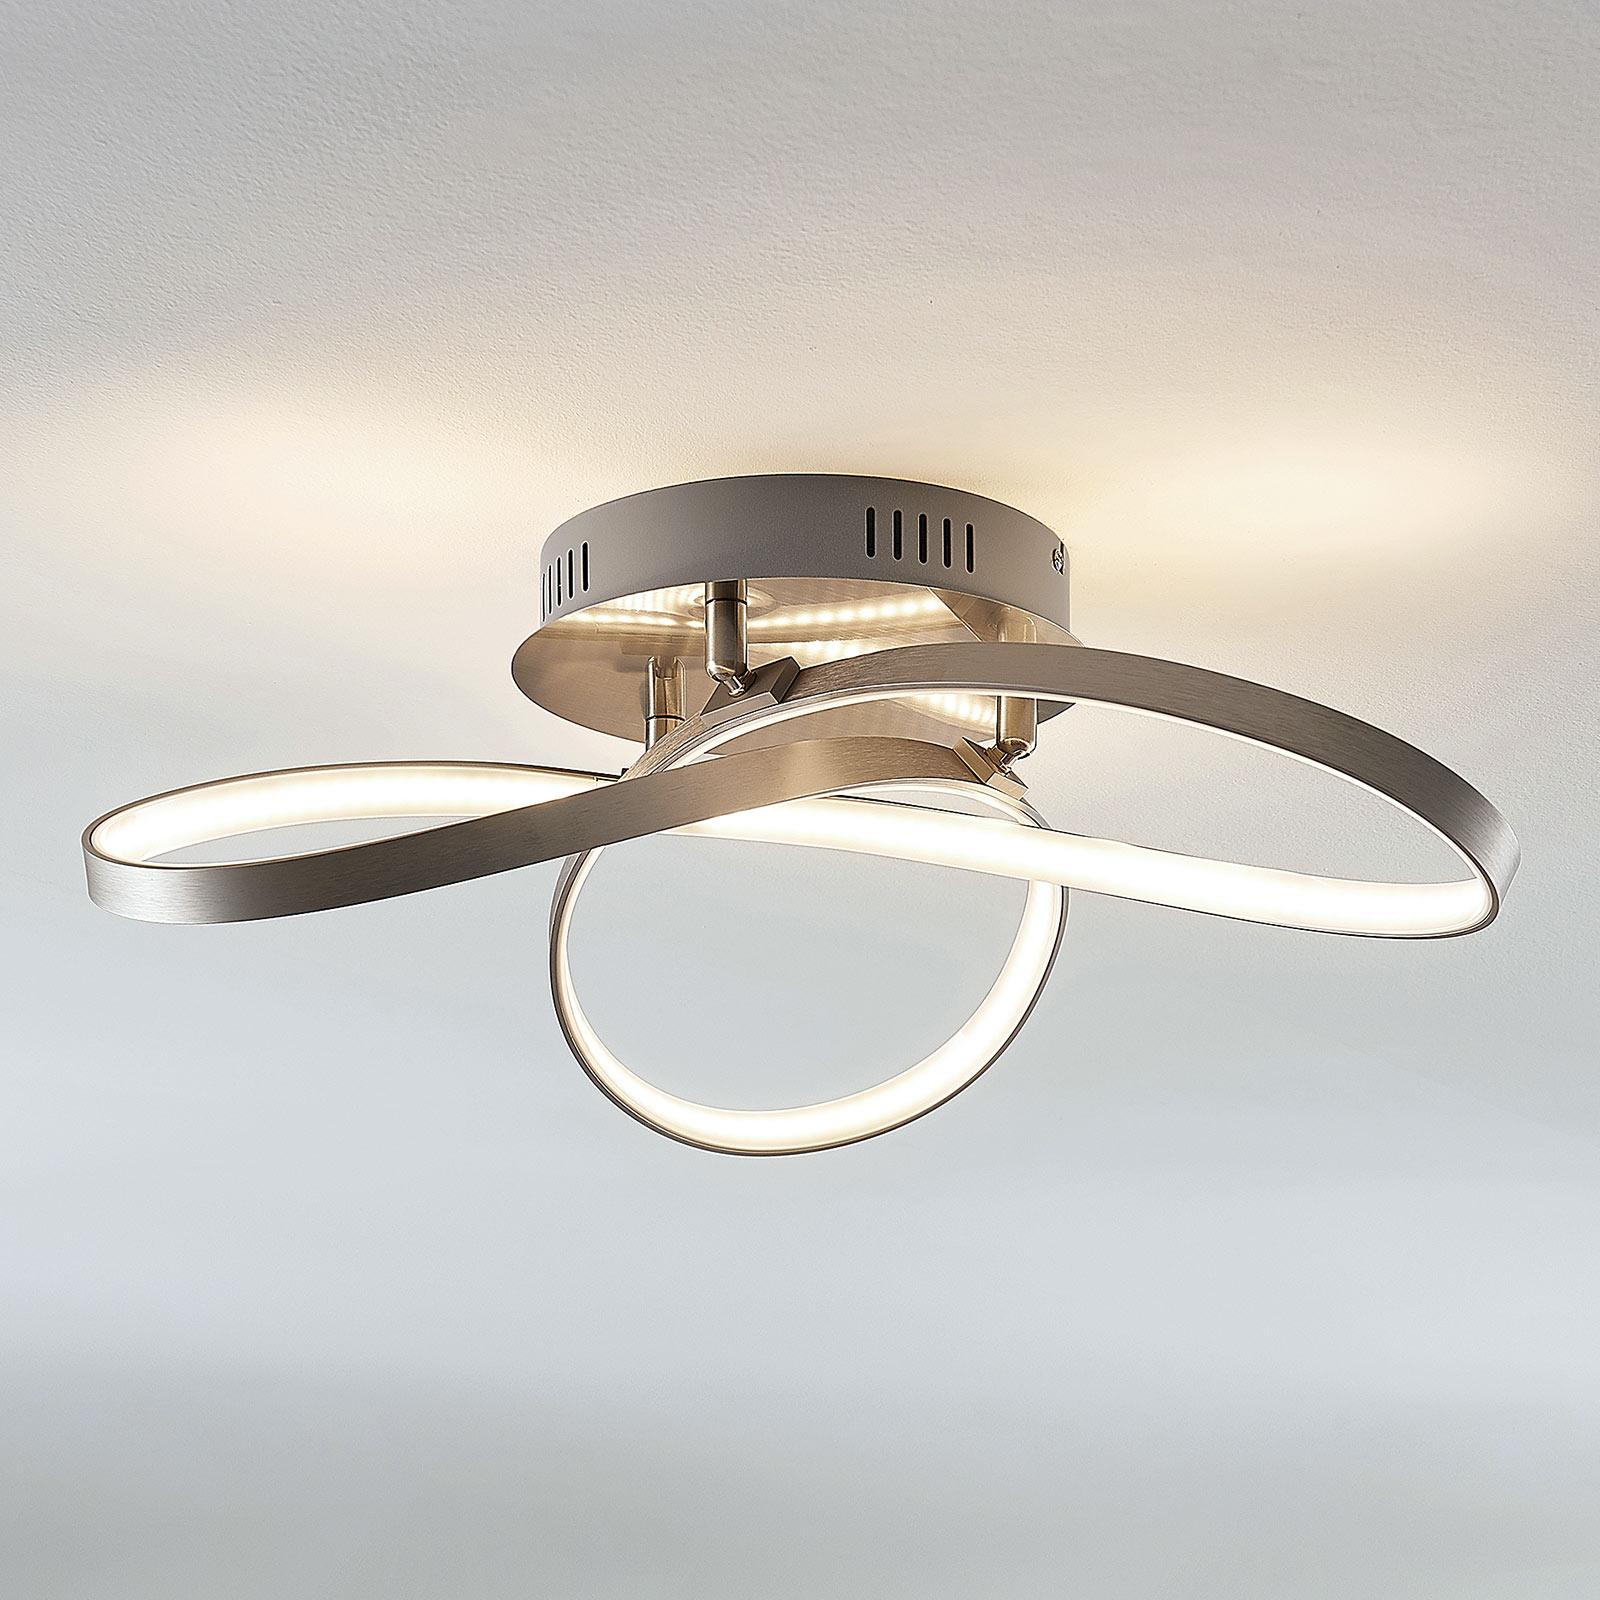 Lampa sufitowa LED Saliha o nowoczesnej formie